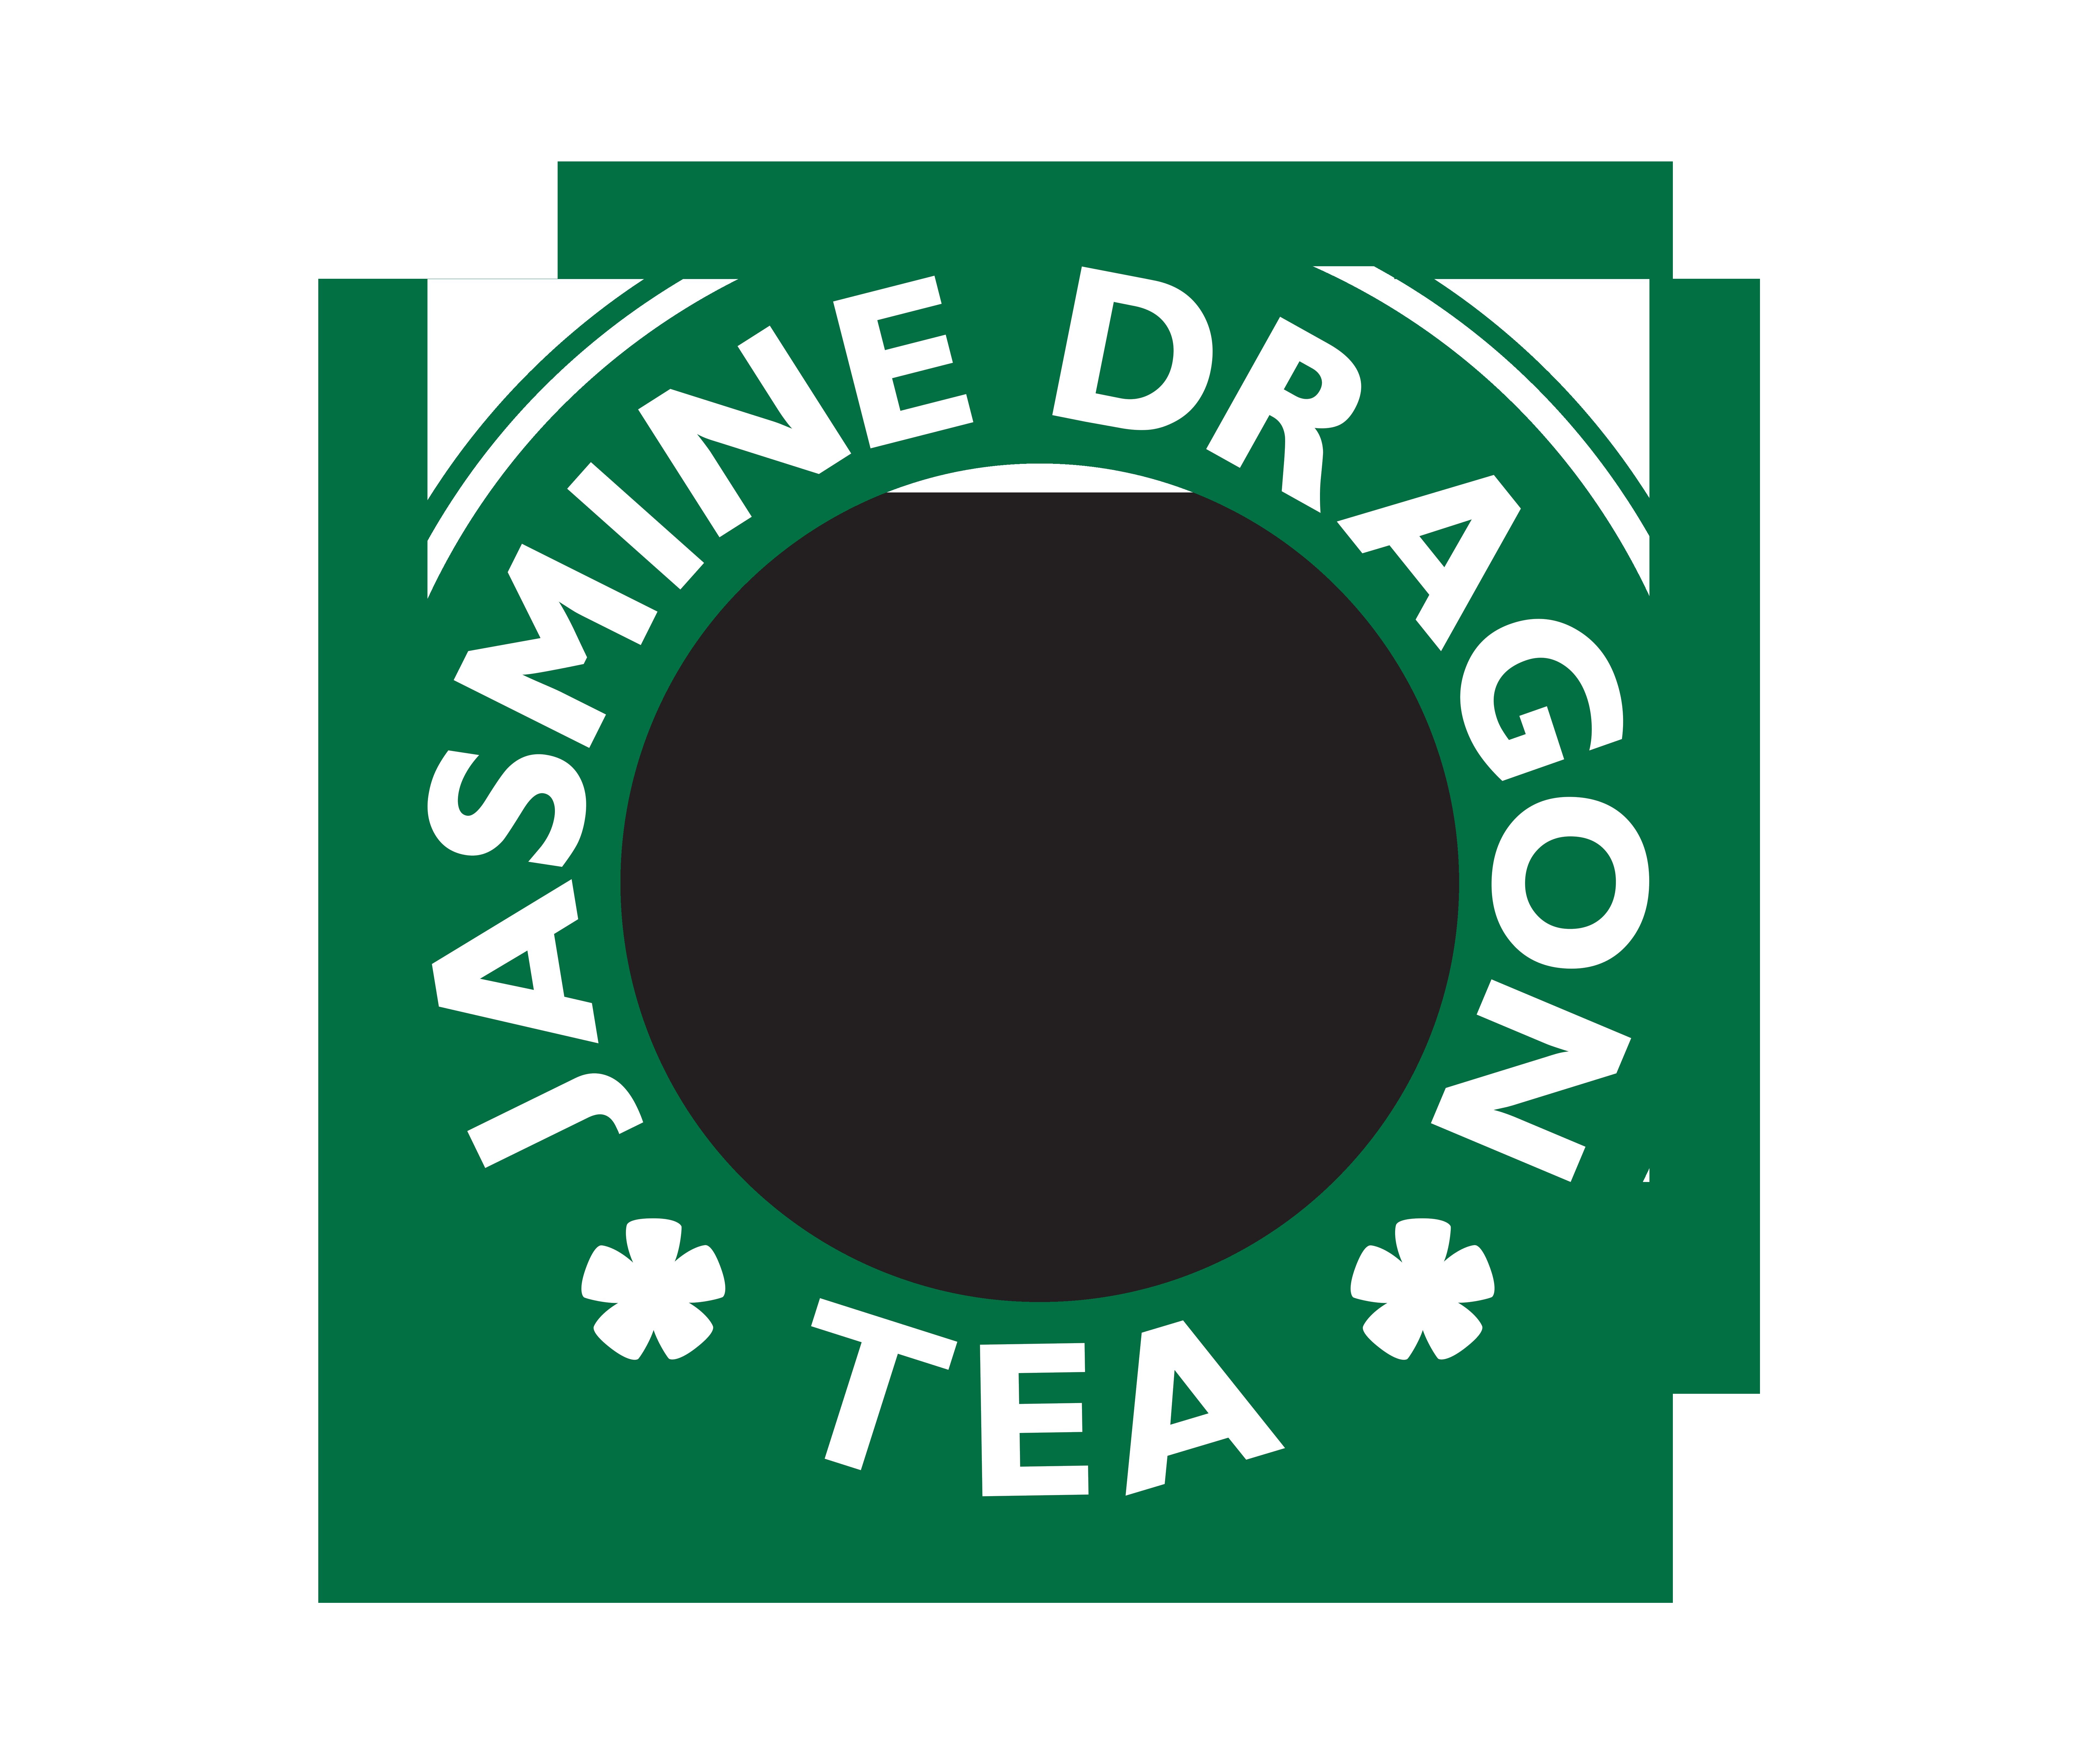 Avatar The Last Airbender: Jasmine Dragon